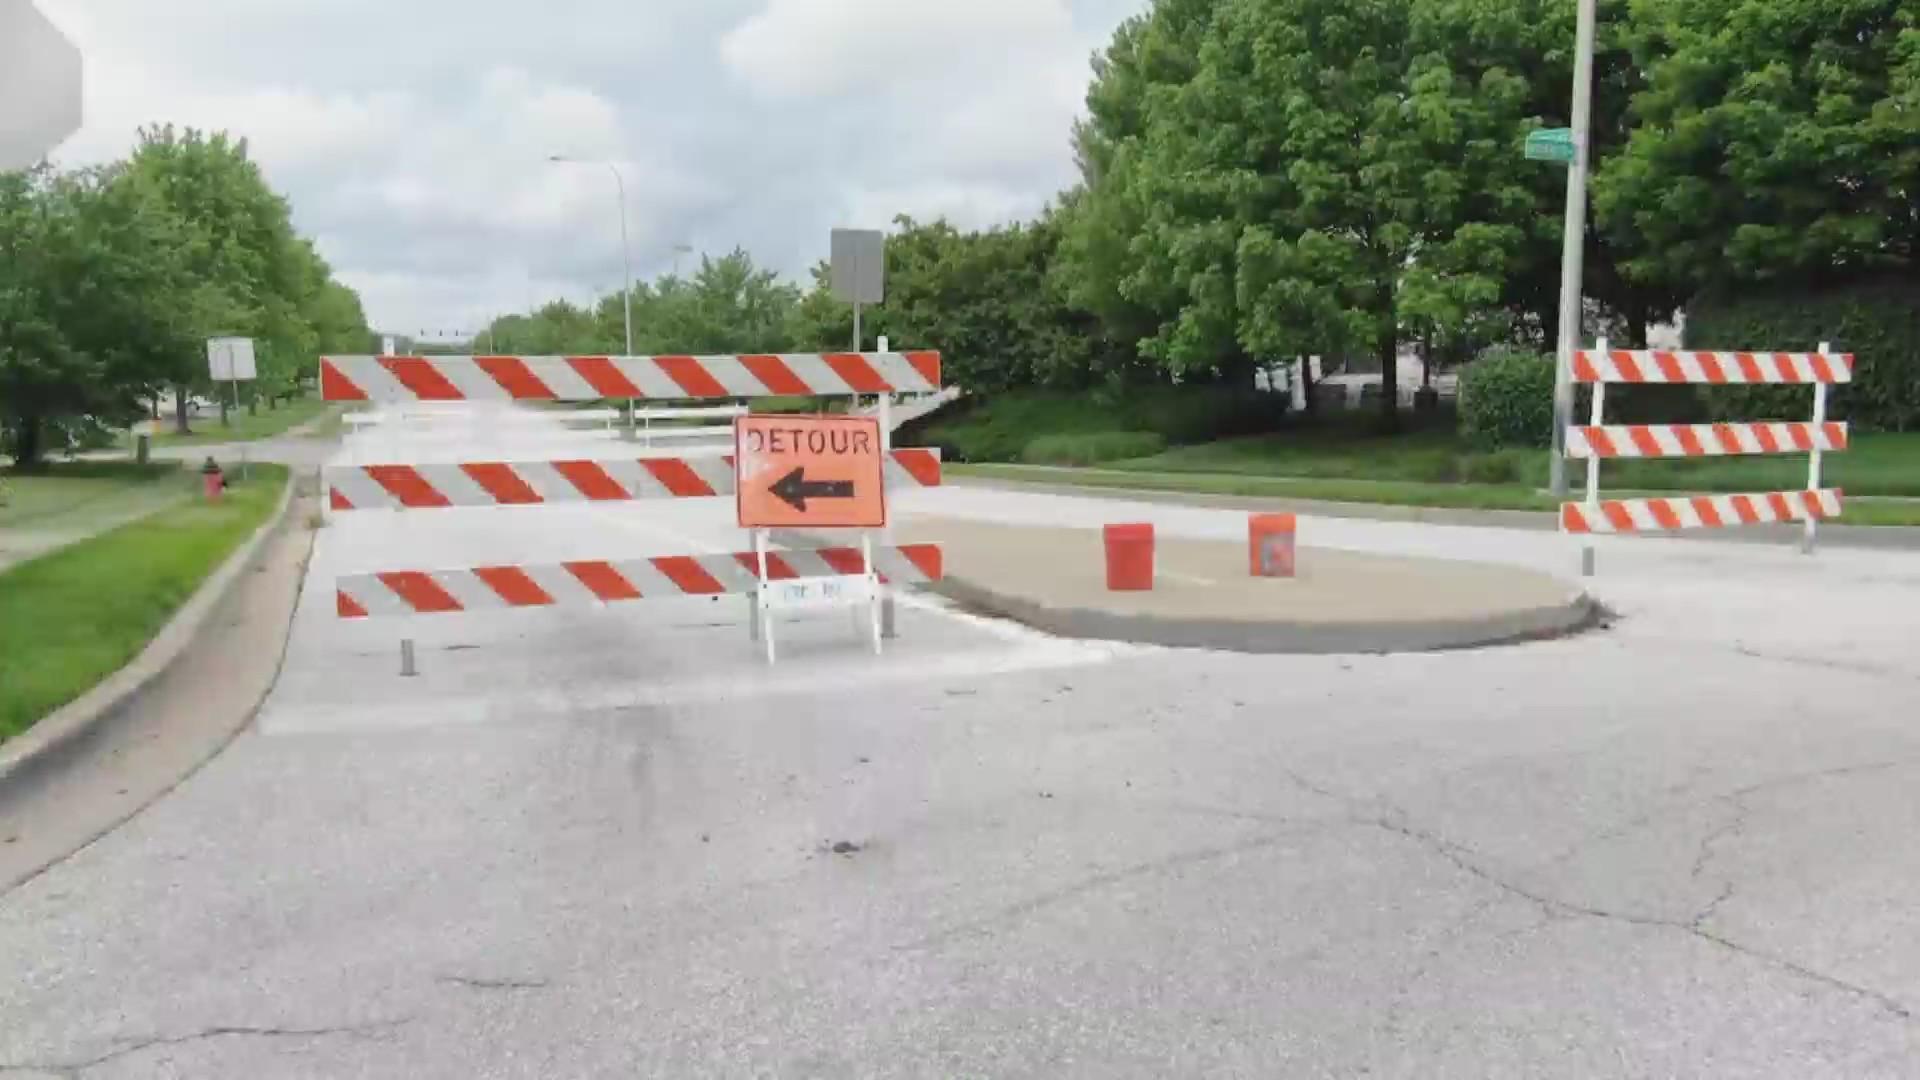 133rd street closure